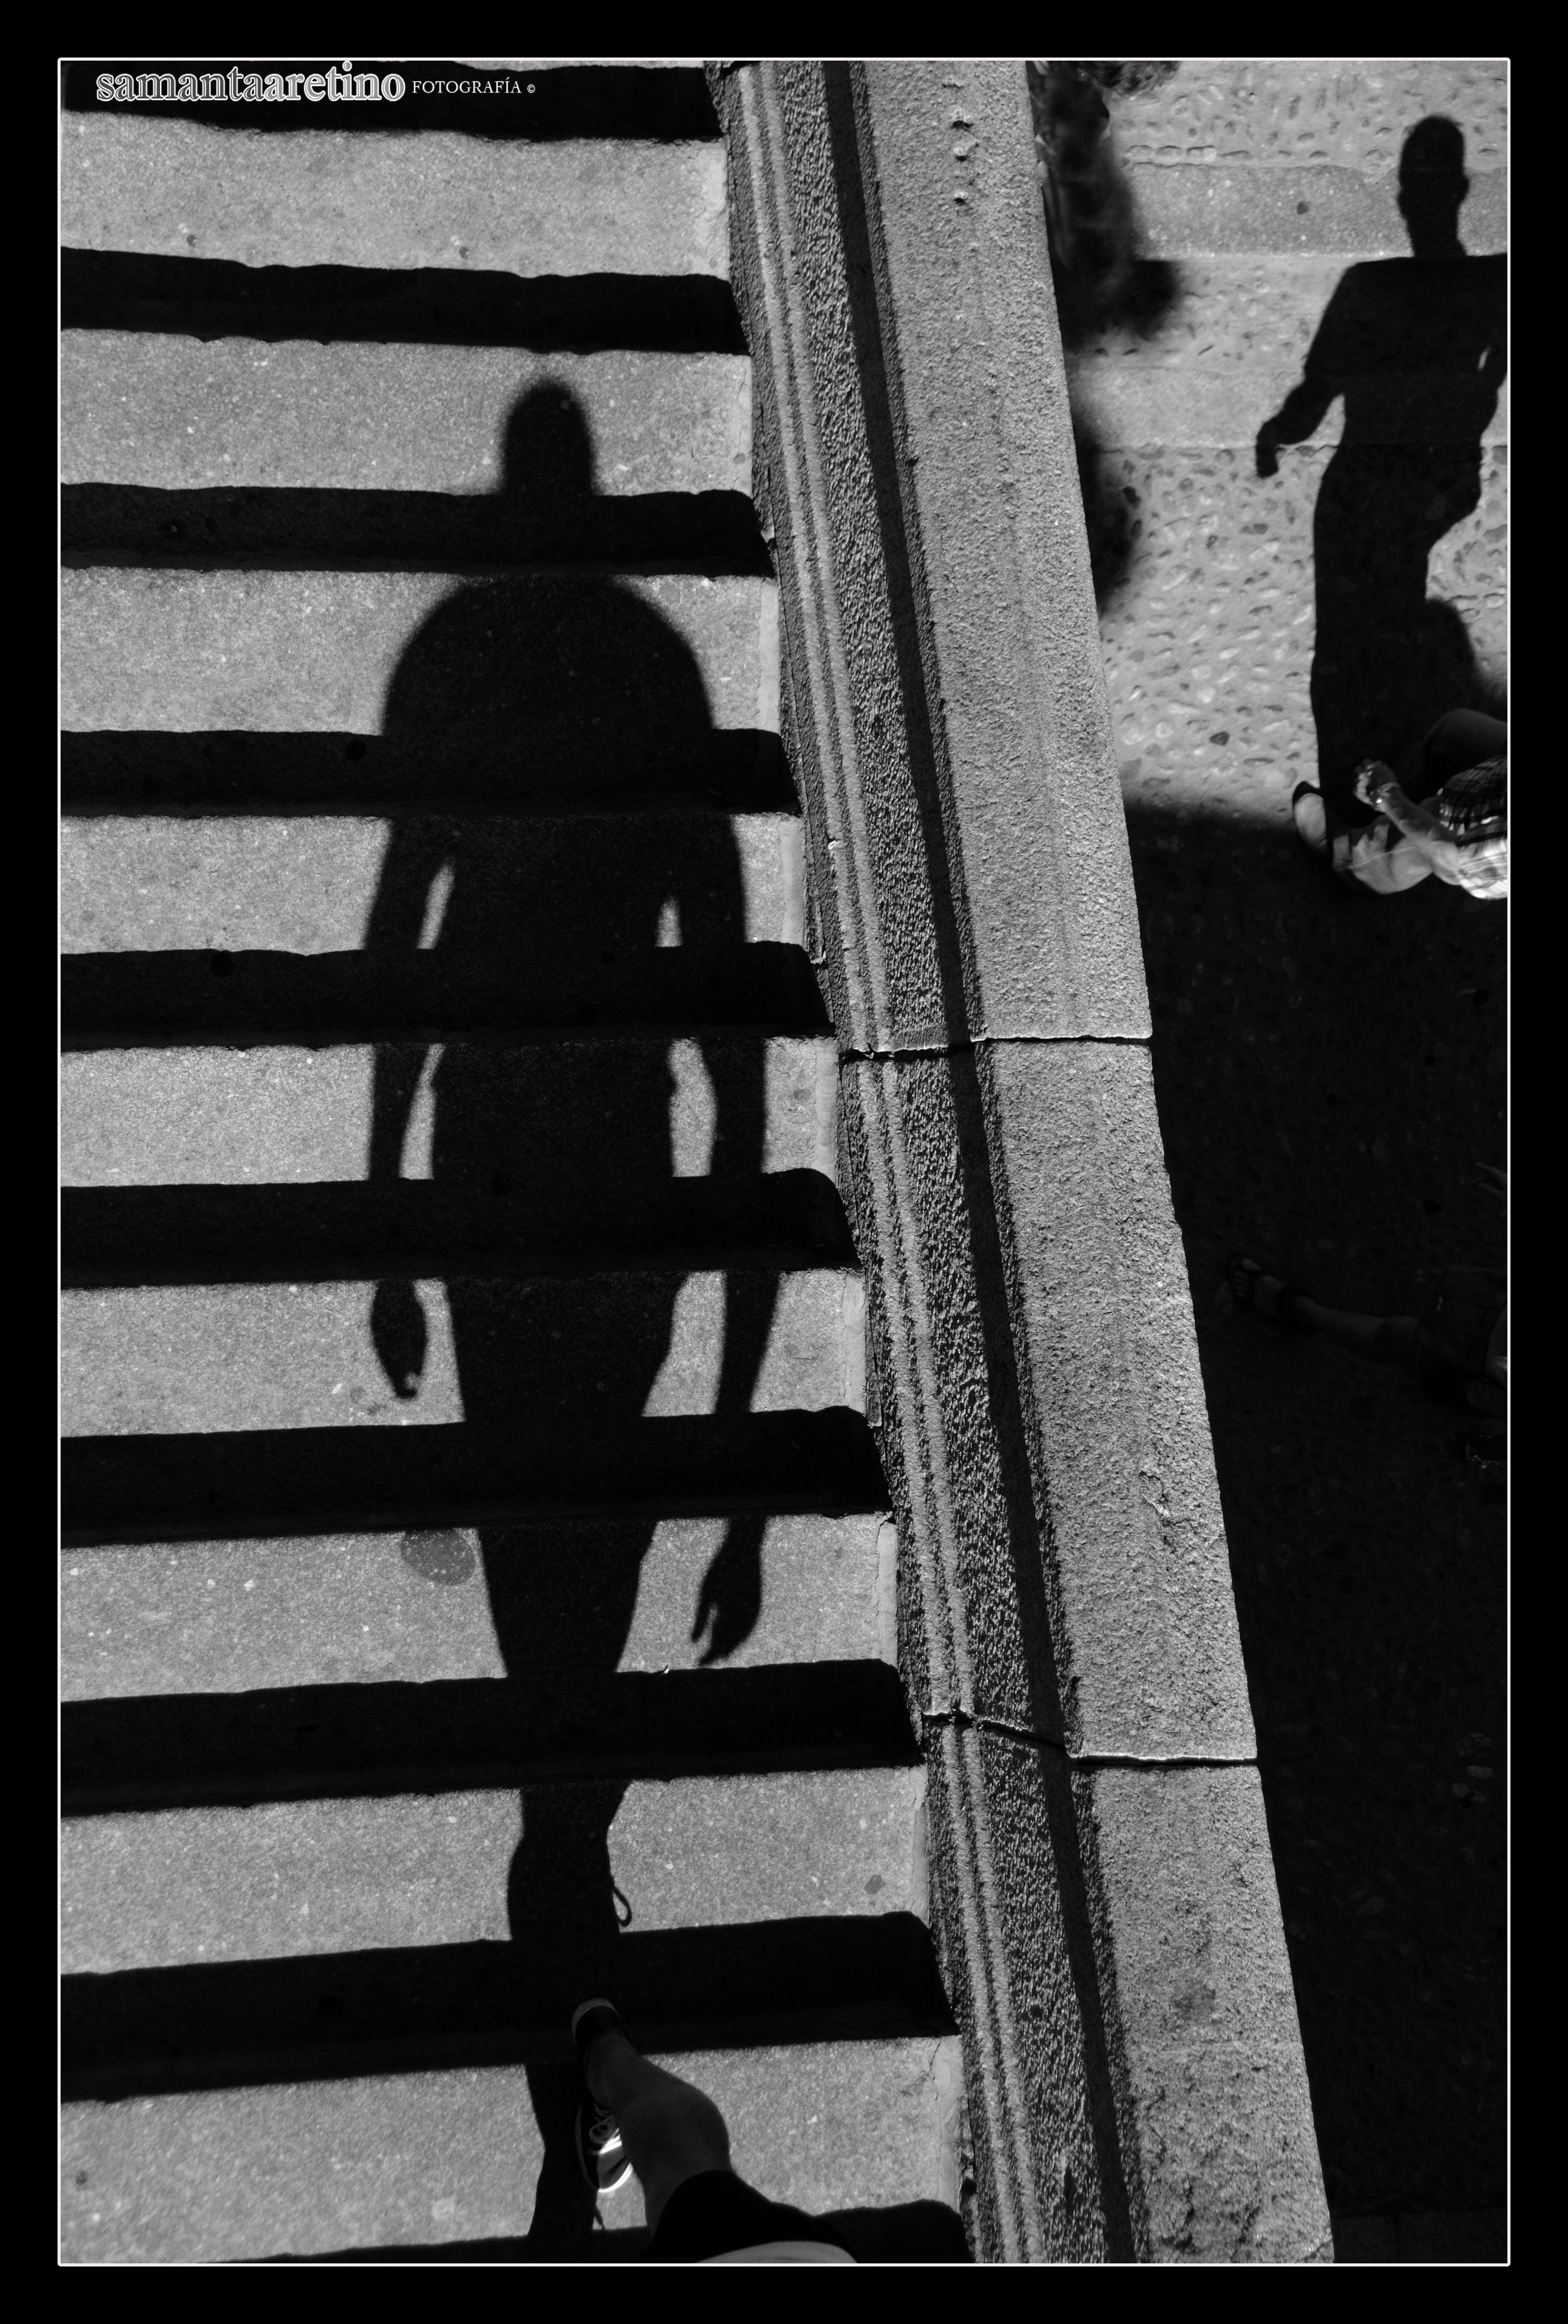 Escalera Sombra